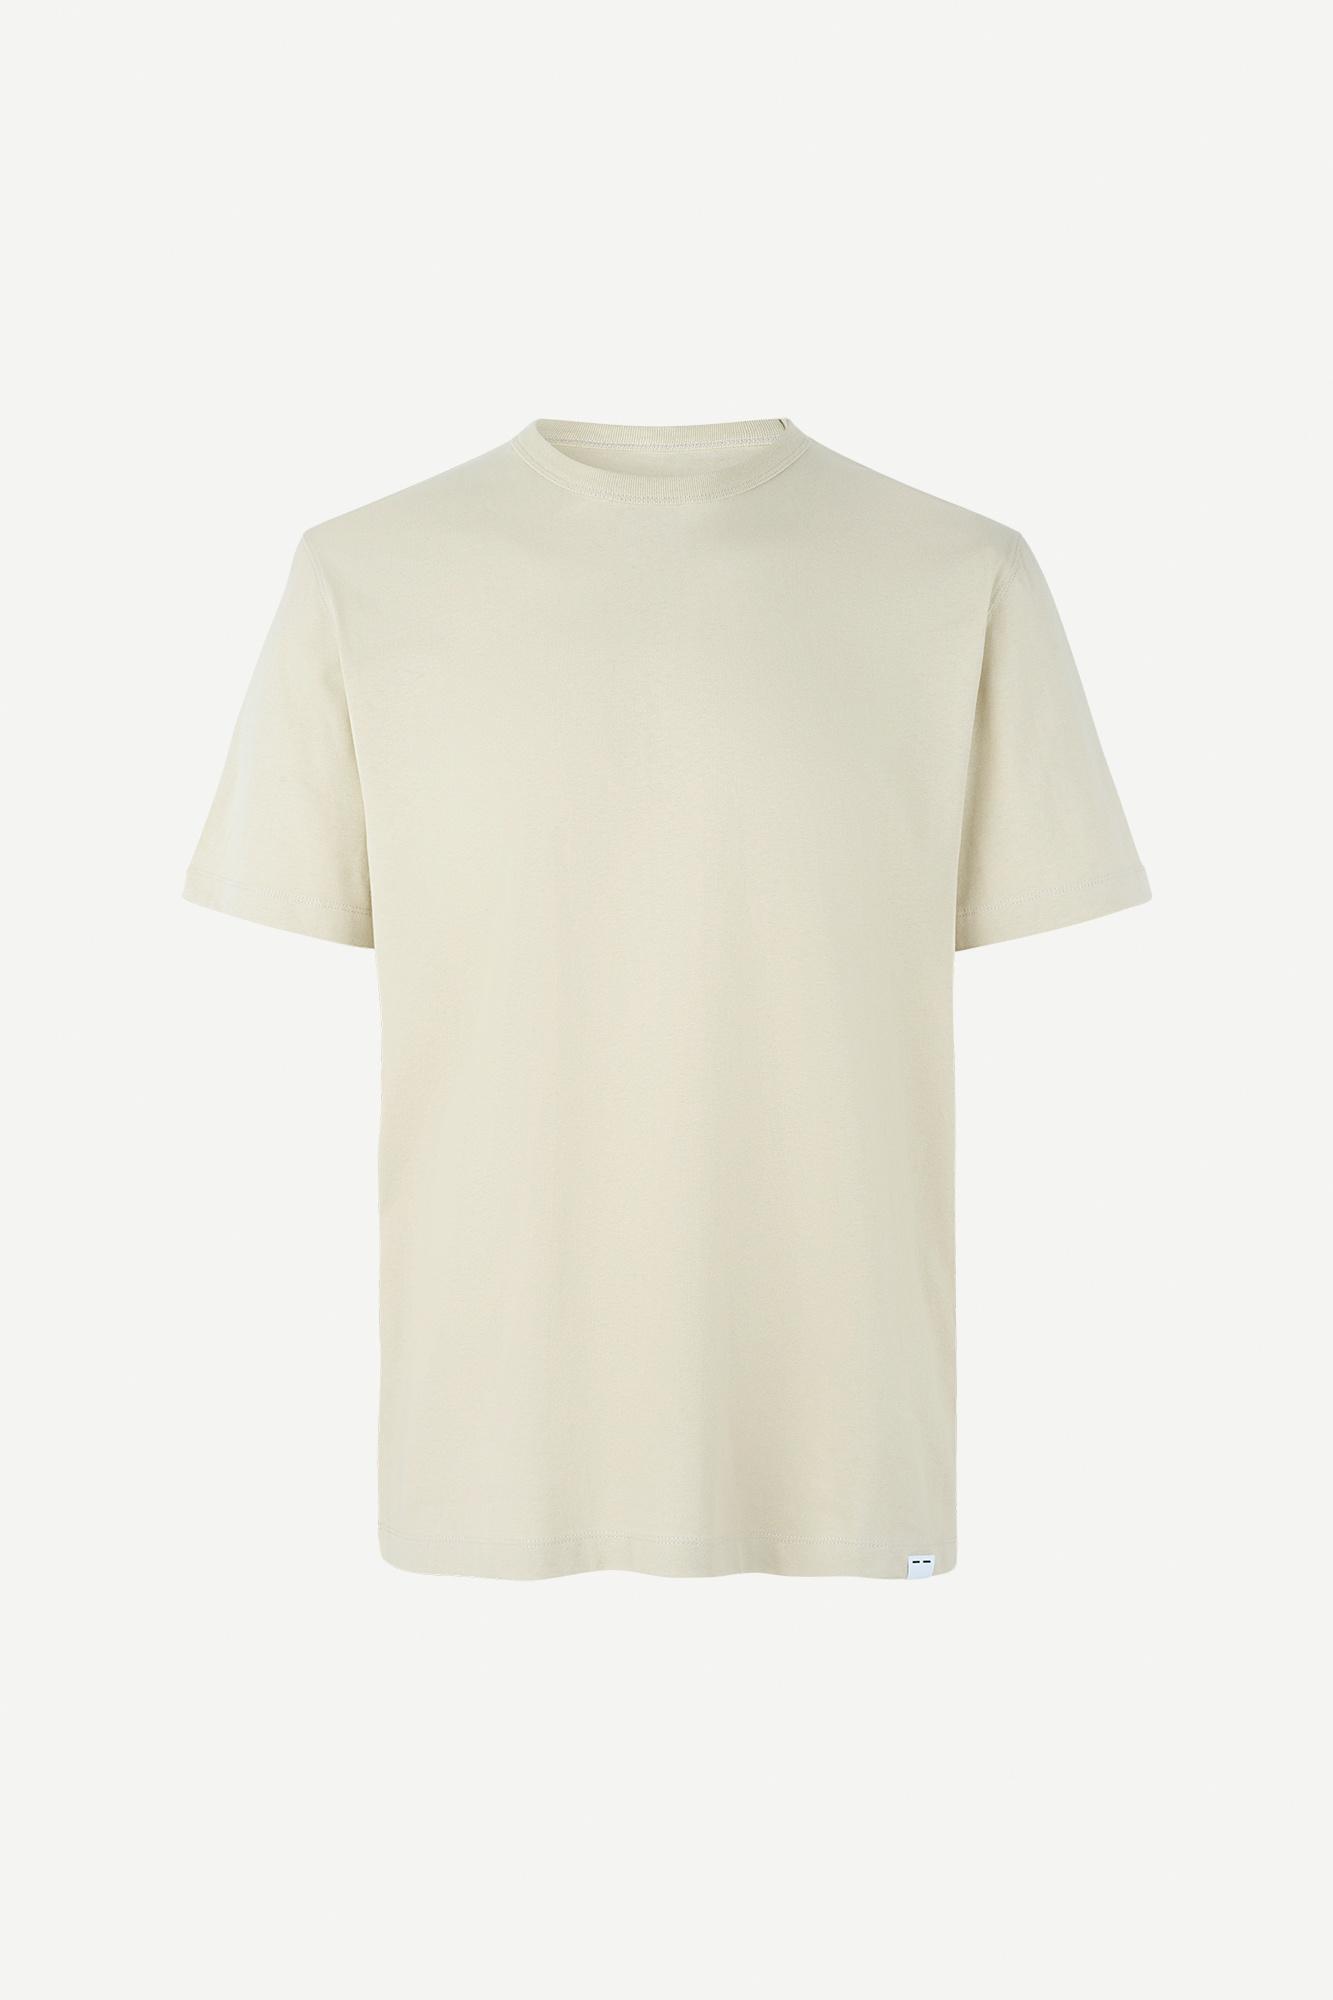 Hugo T-Shirt Crème Wit-1